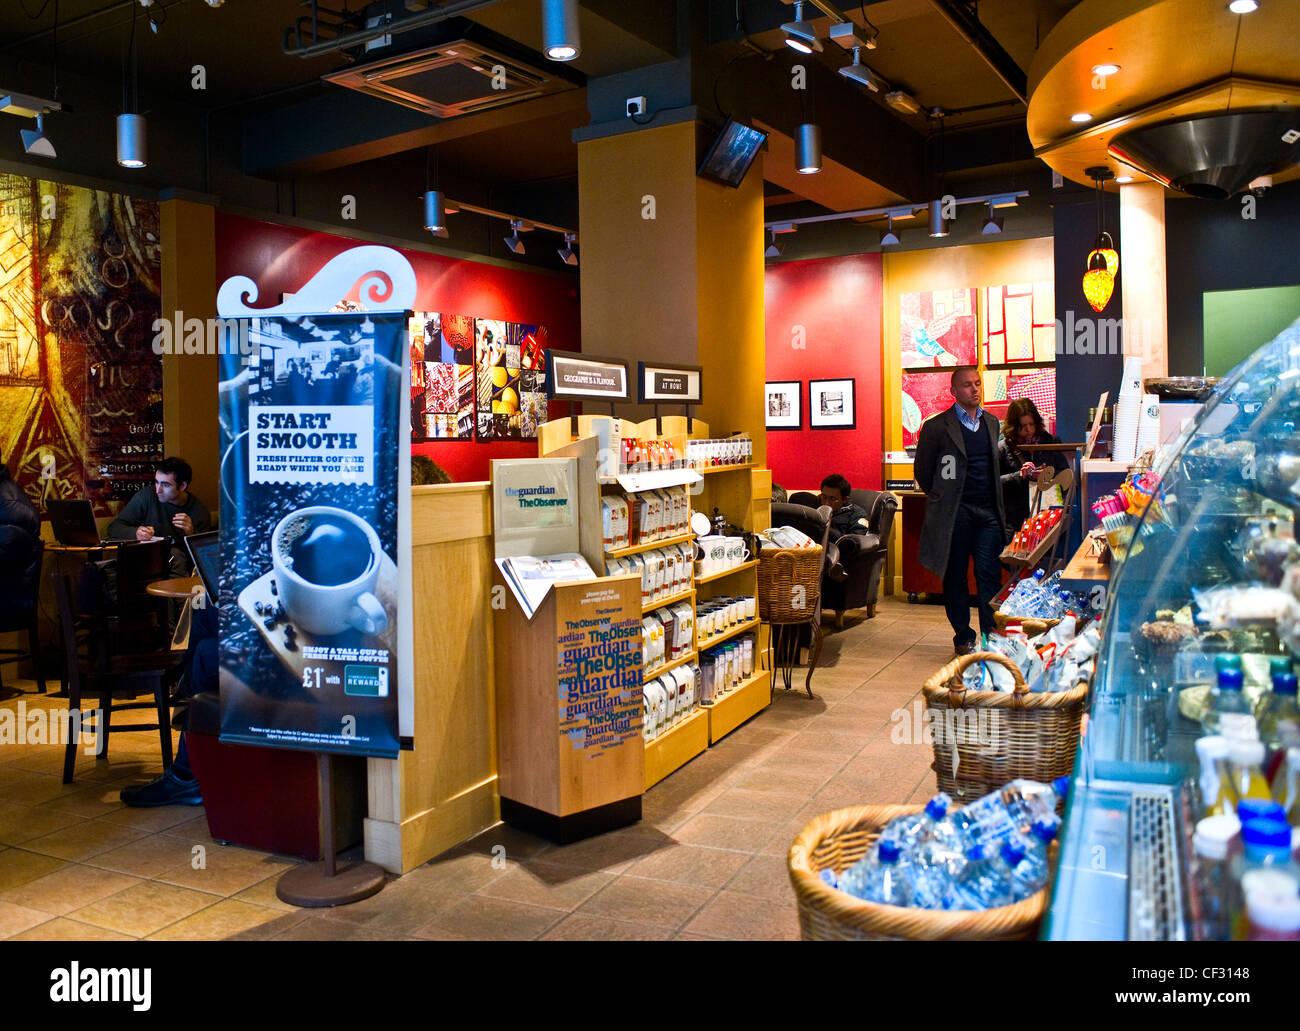 The interior of a Starbucks Coffee Shop Stock Photo: 43707336 - Alamy